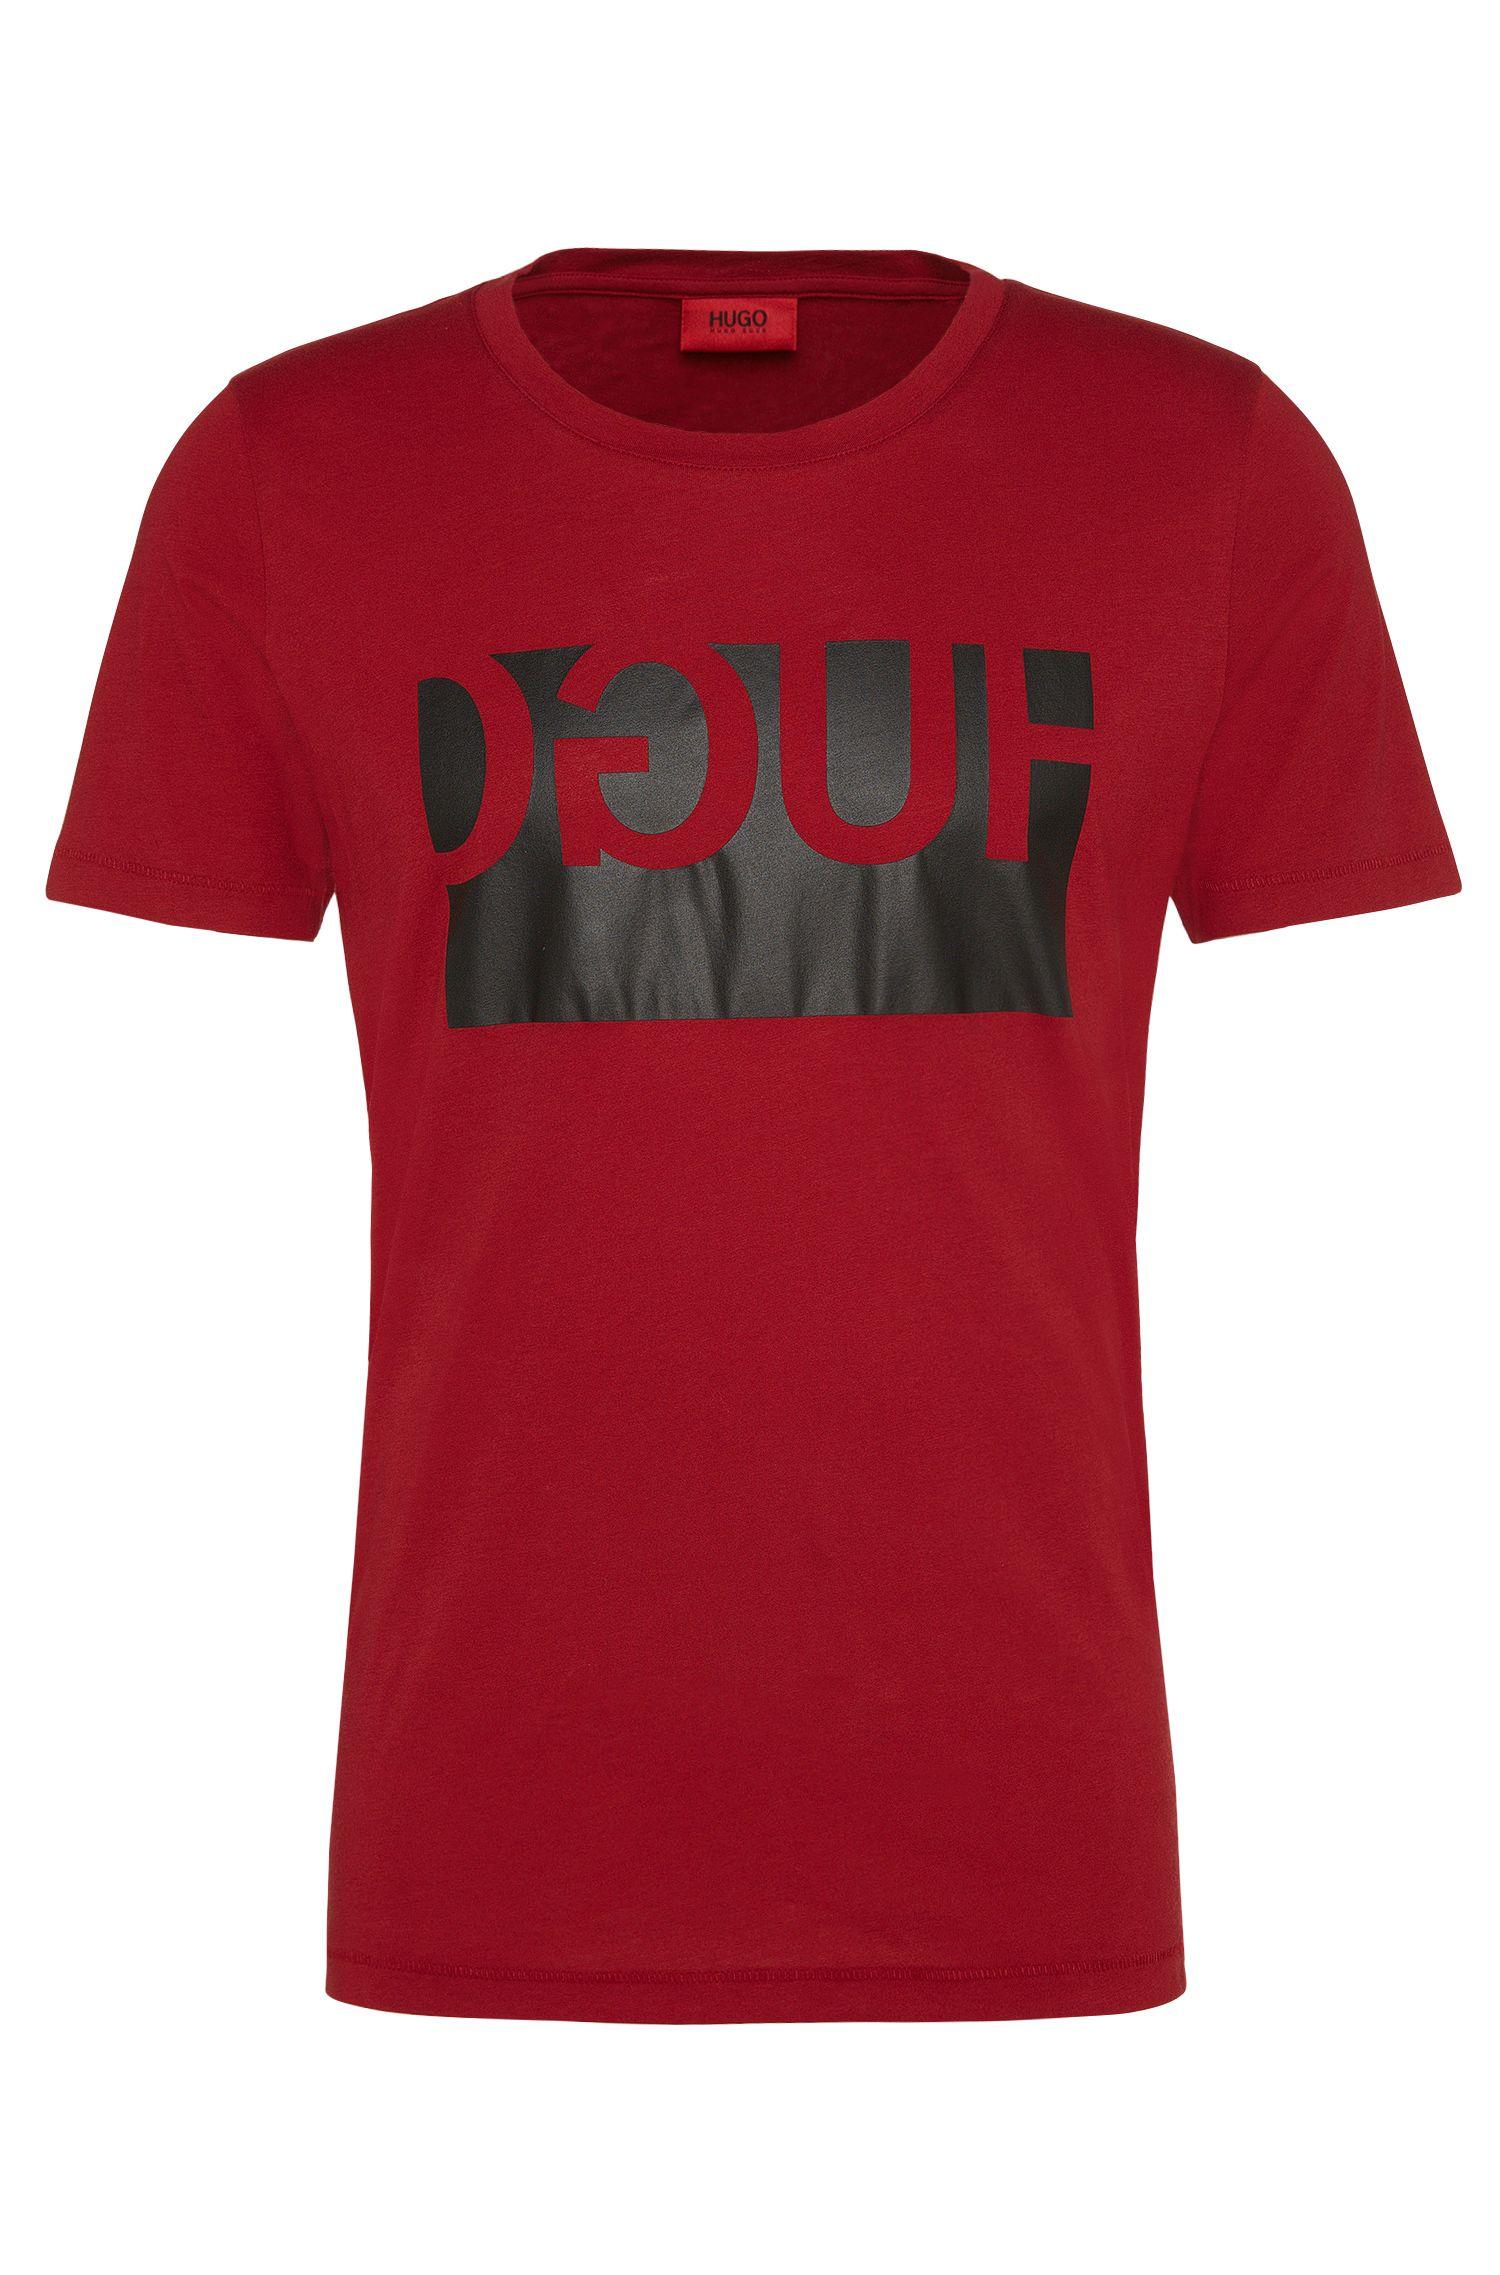 'Doguh' | Cotton Rubberized Logo T-Shirt